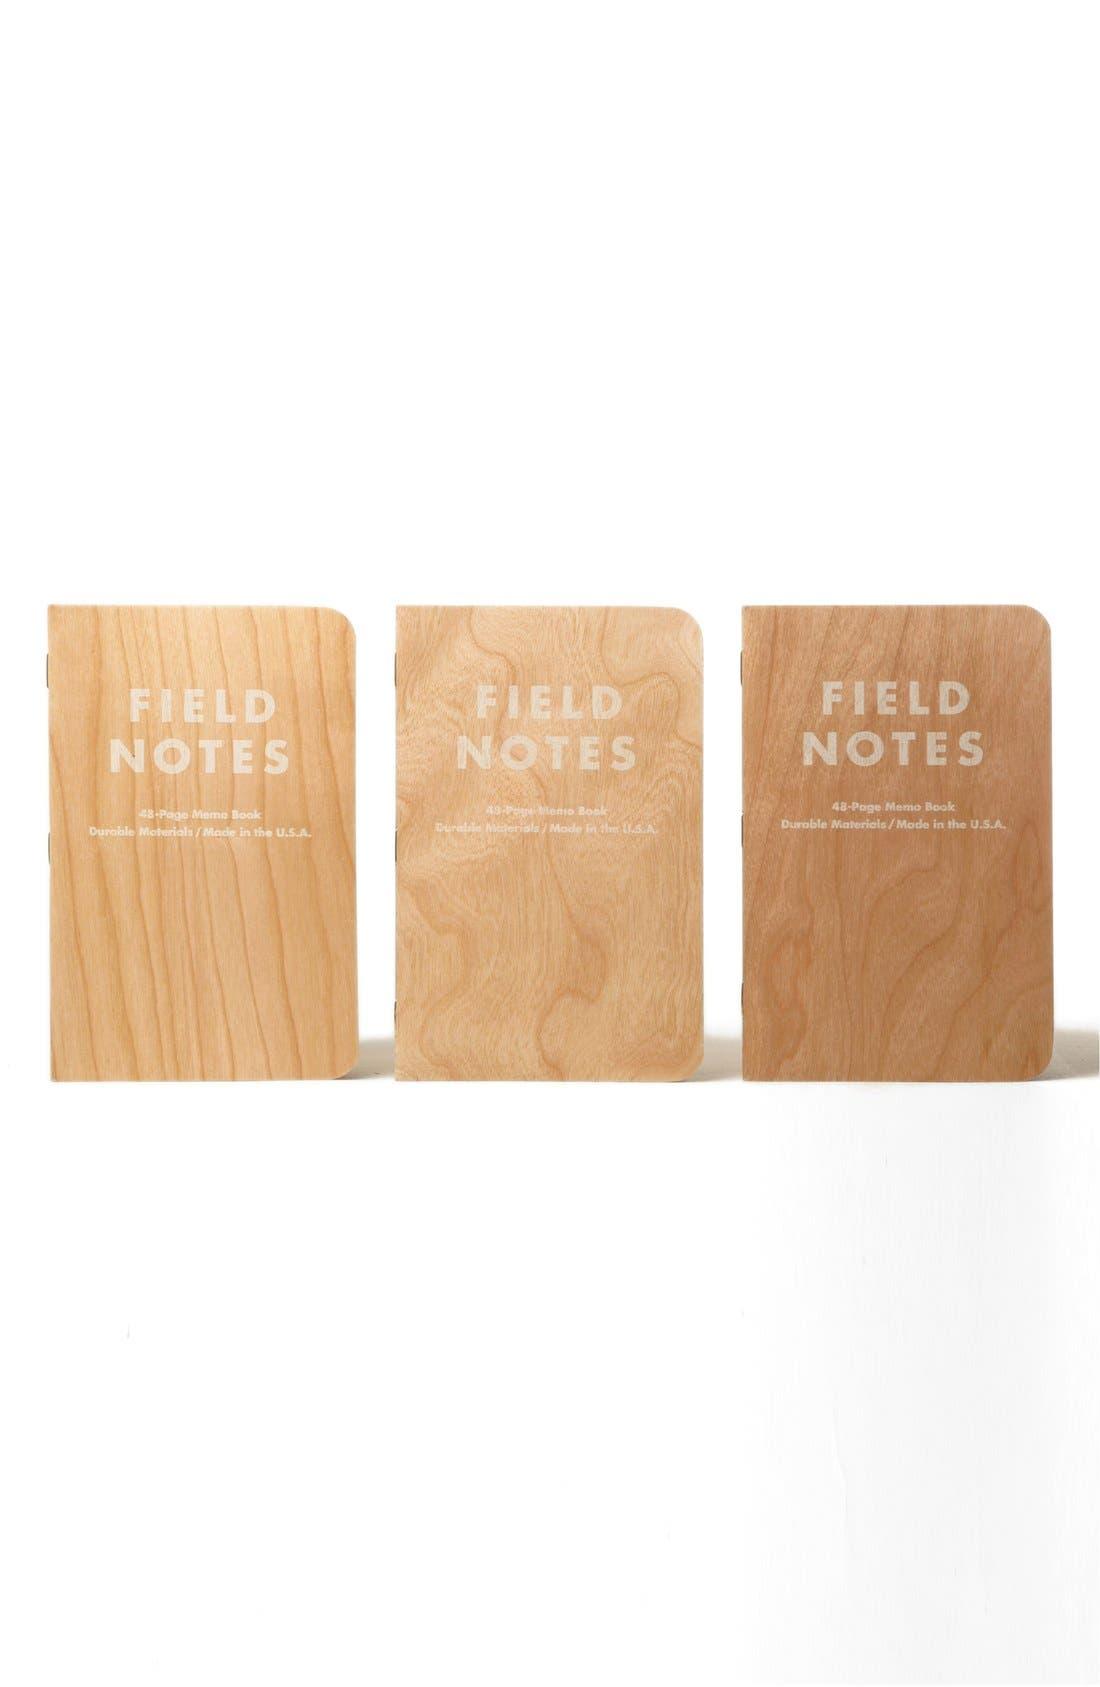 Alternate Image 1 Selected - Field Notes 'Shelterwood' Memo Books (3-Pack)